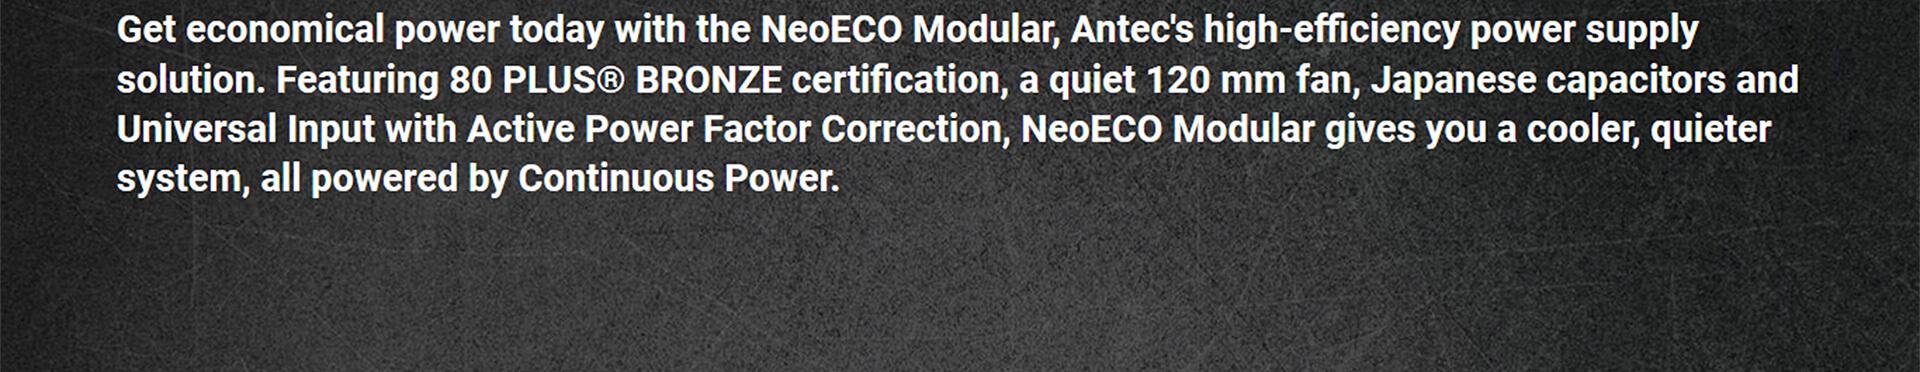 NeoECO-Modular-650-V2---antec_04.jpg